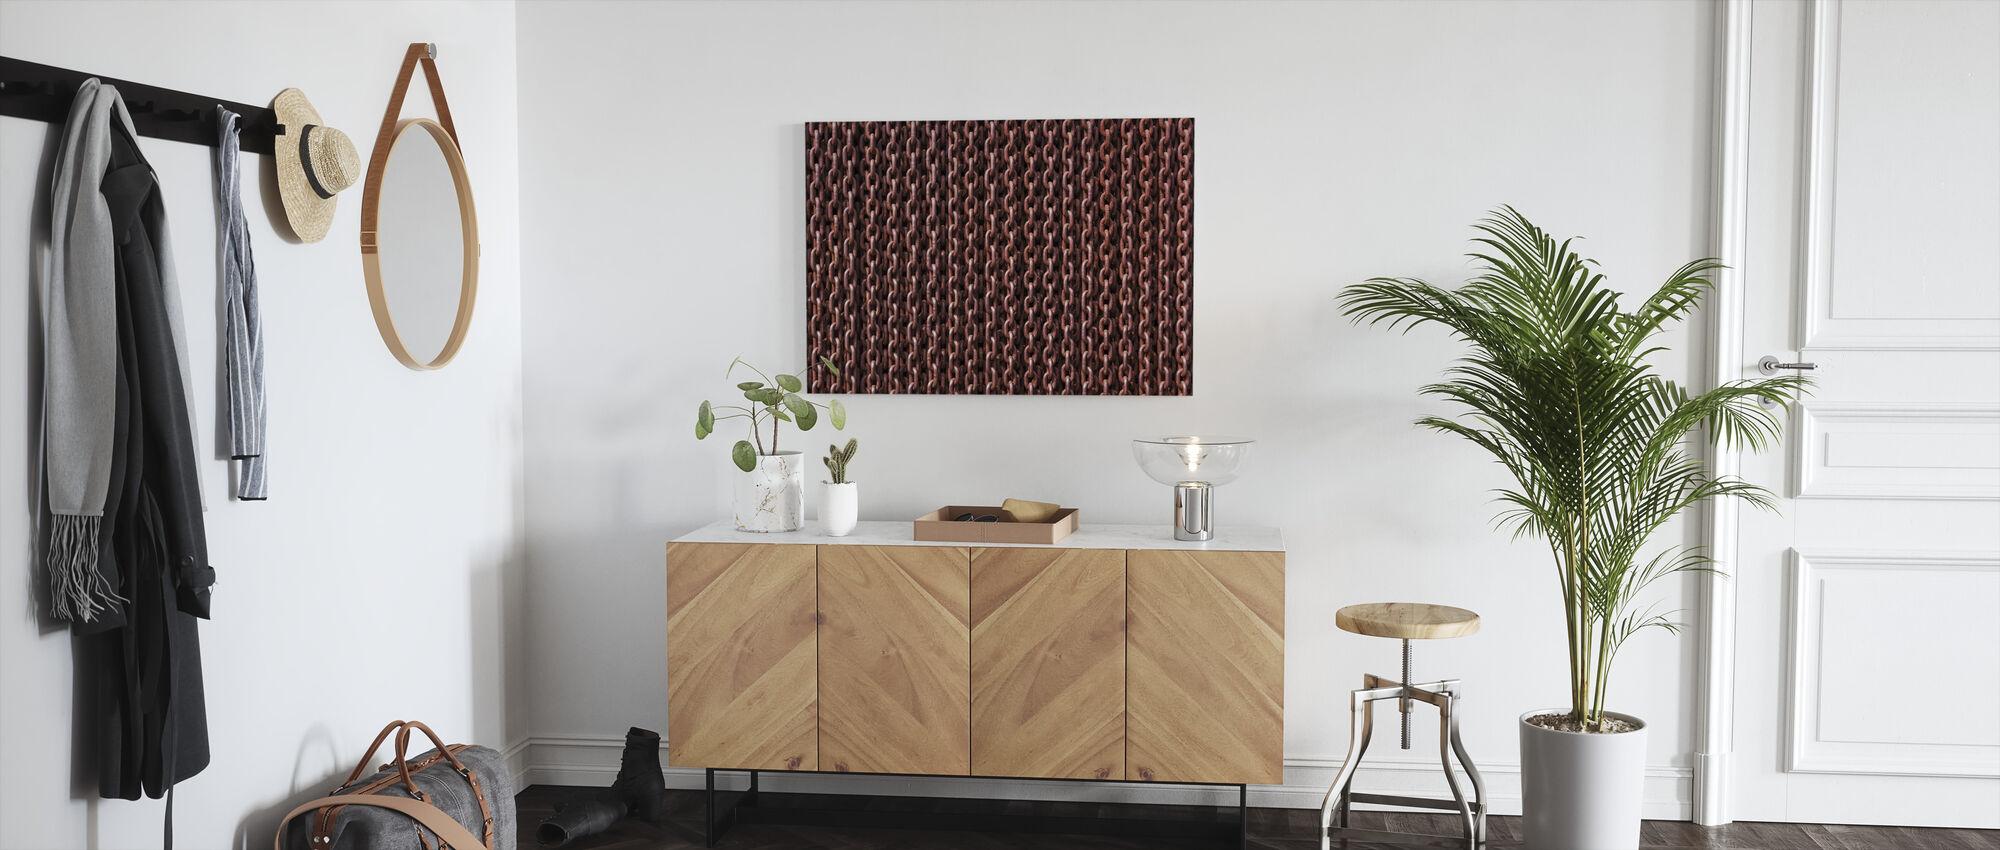 Rusty Chains - Canvas print - Hallway